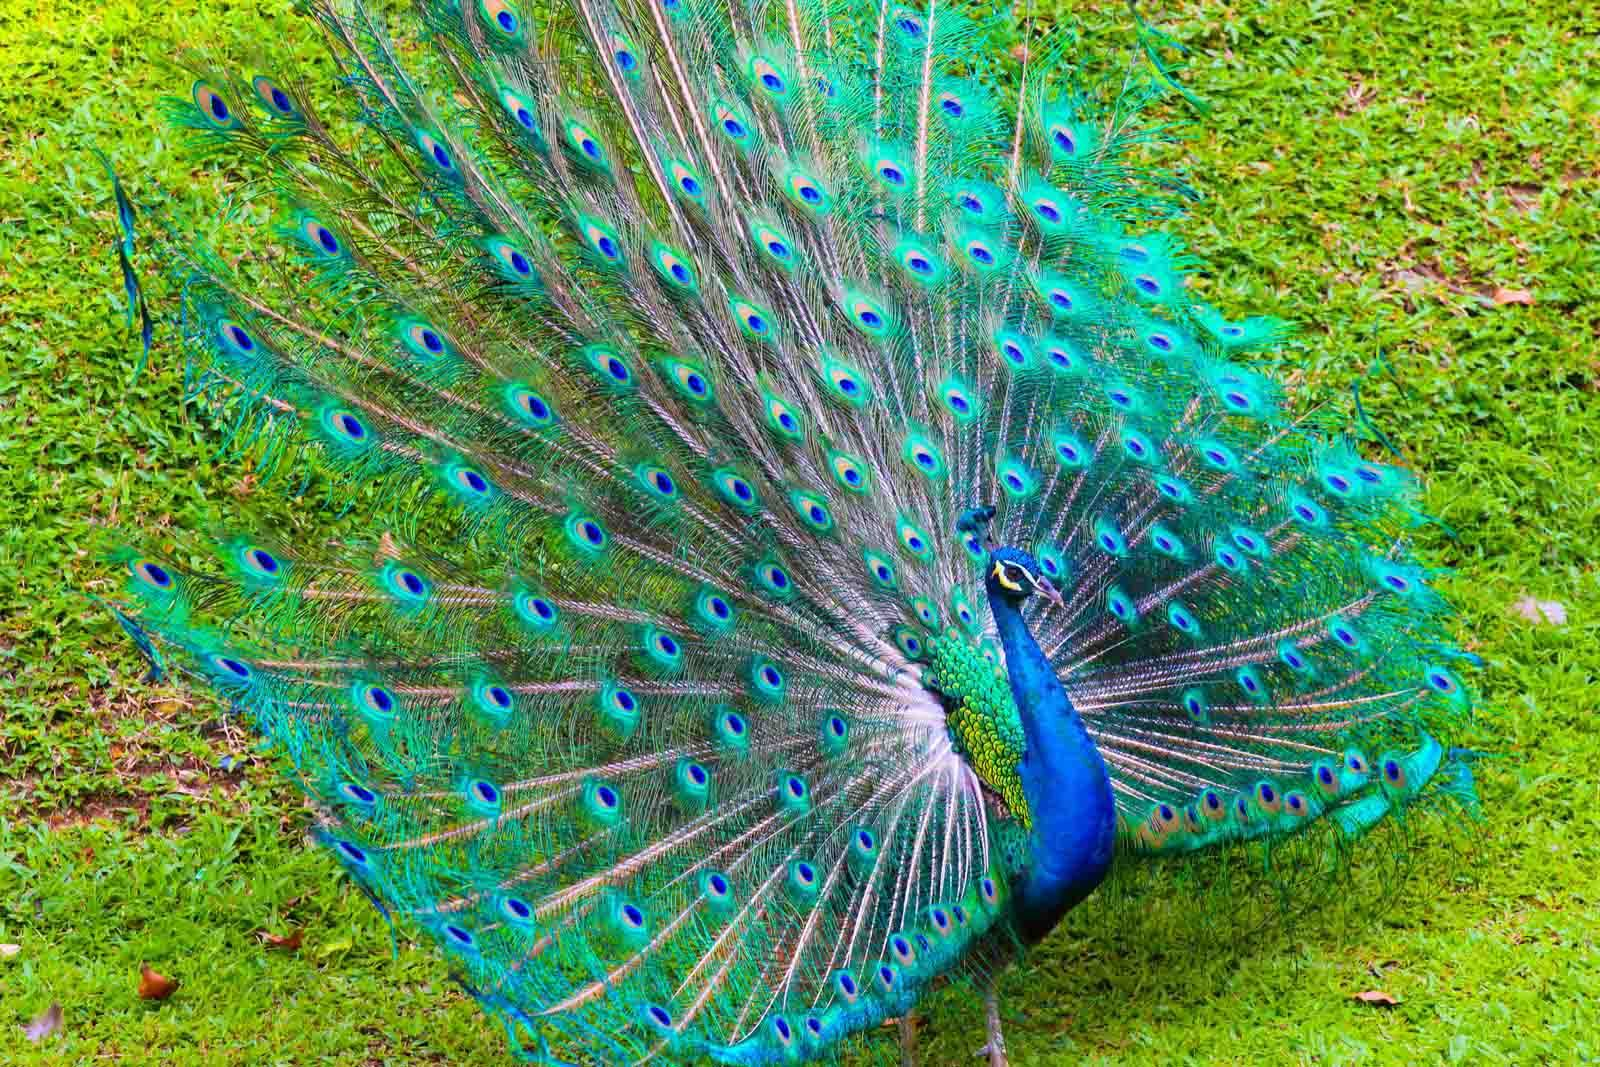 Beautiful Peacock Background Hd Wallpaper Peacock Tail, - Beautiful Peacock , HD Wallpaper & Backgrounds